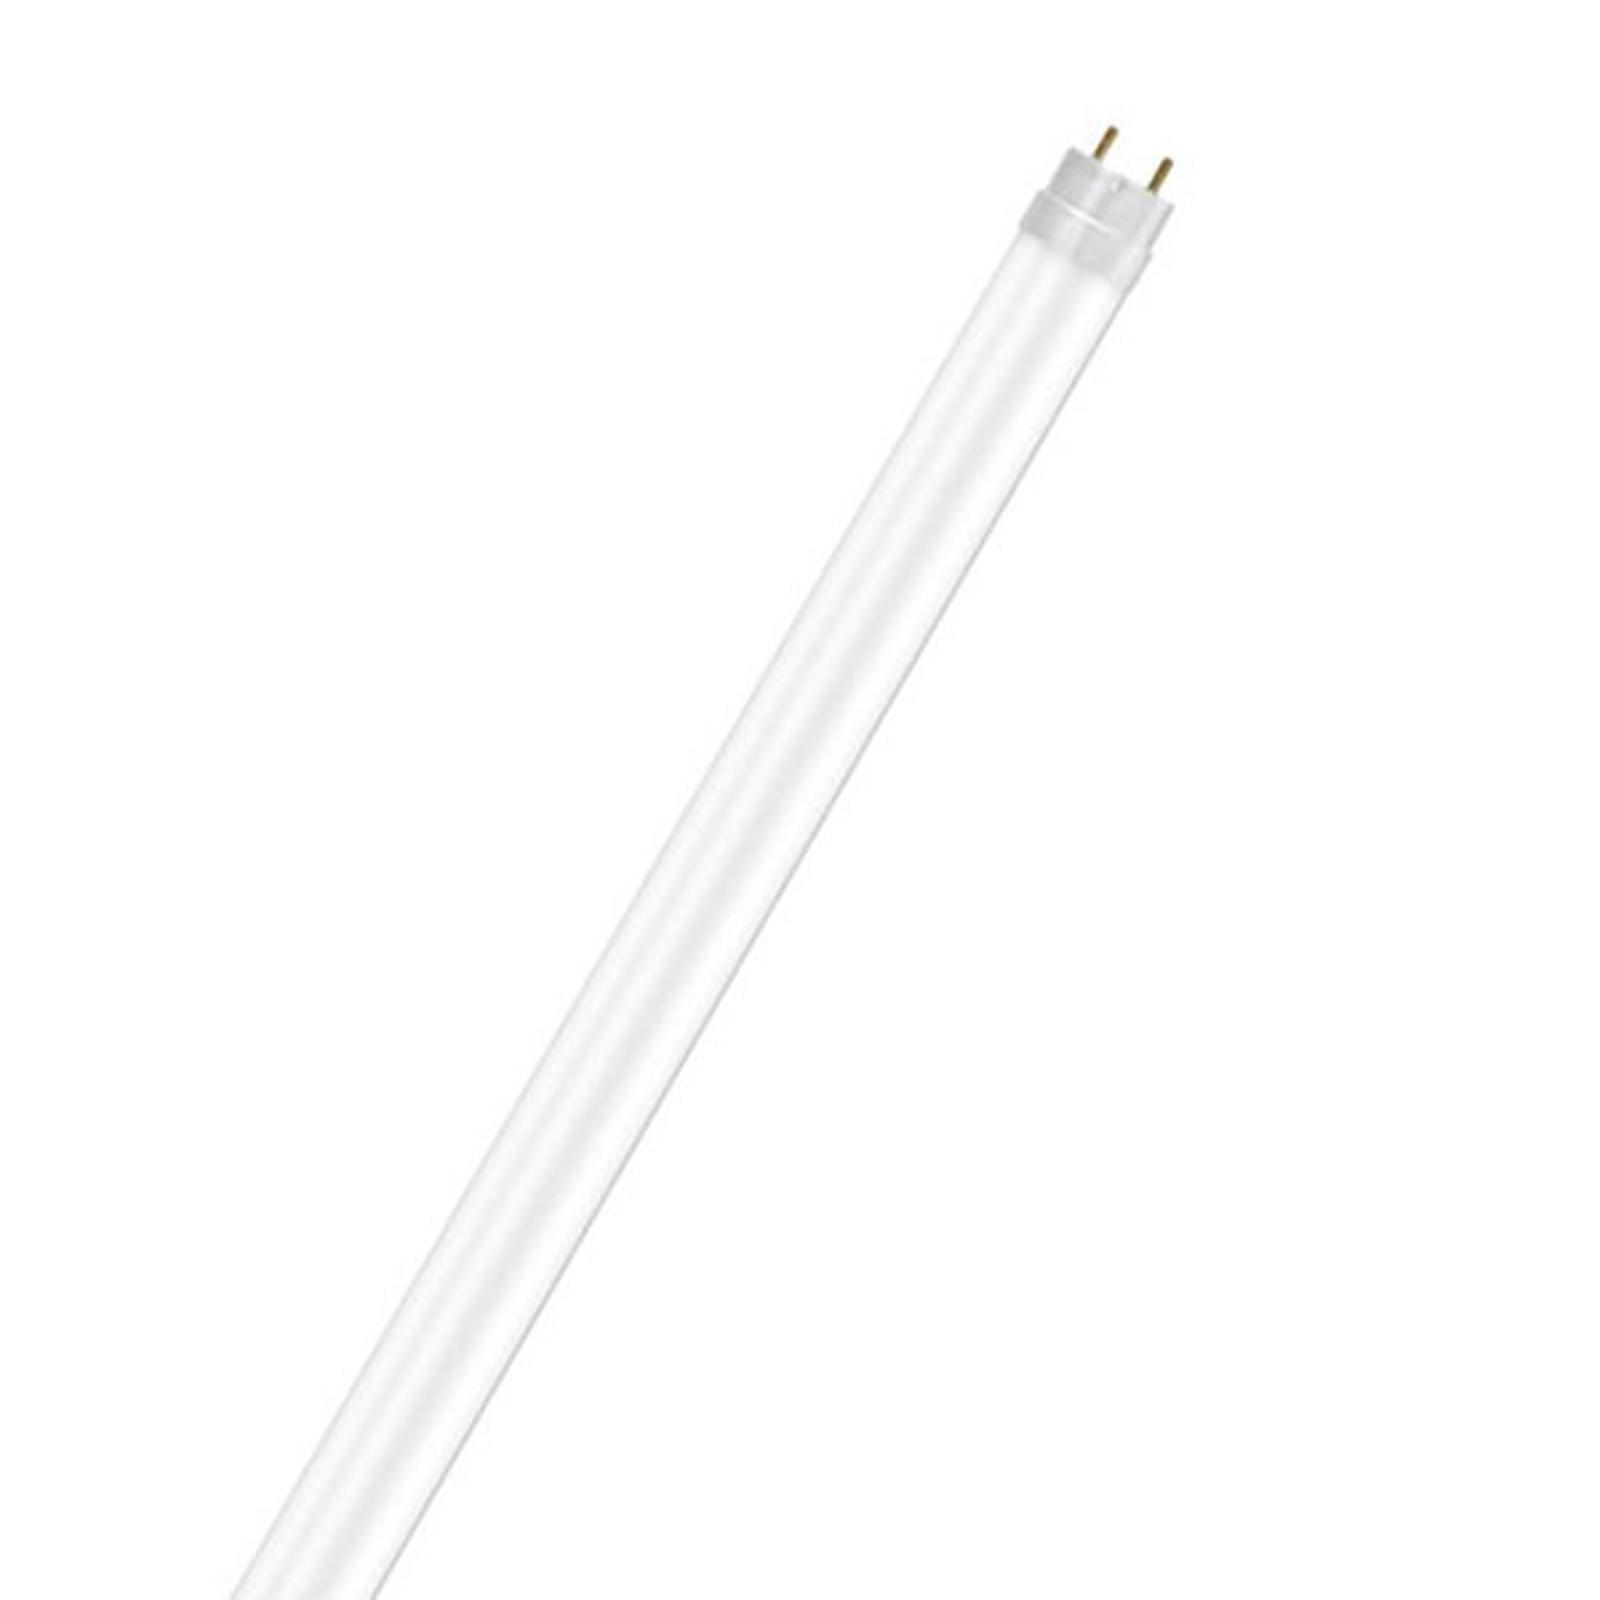 OSRAM-LED-putki G13 120cm SubstiTUBE 16W 3 000 K